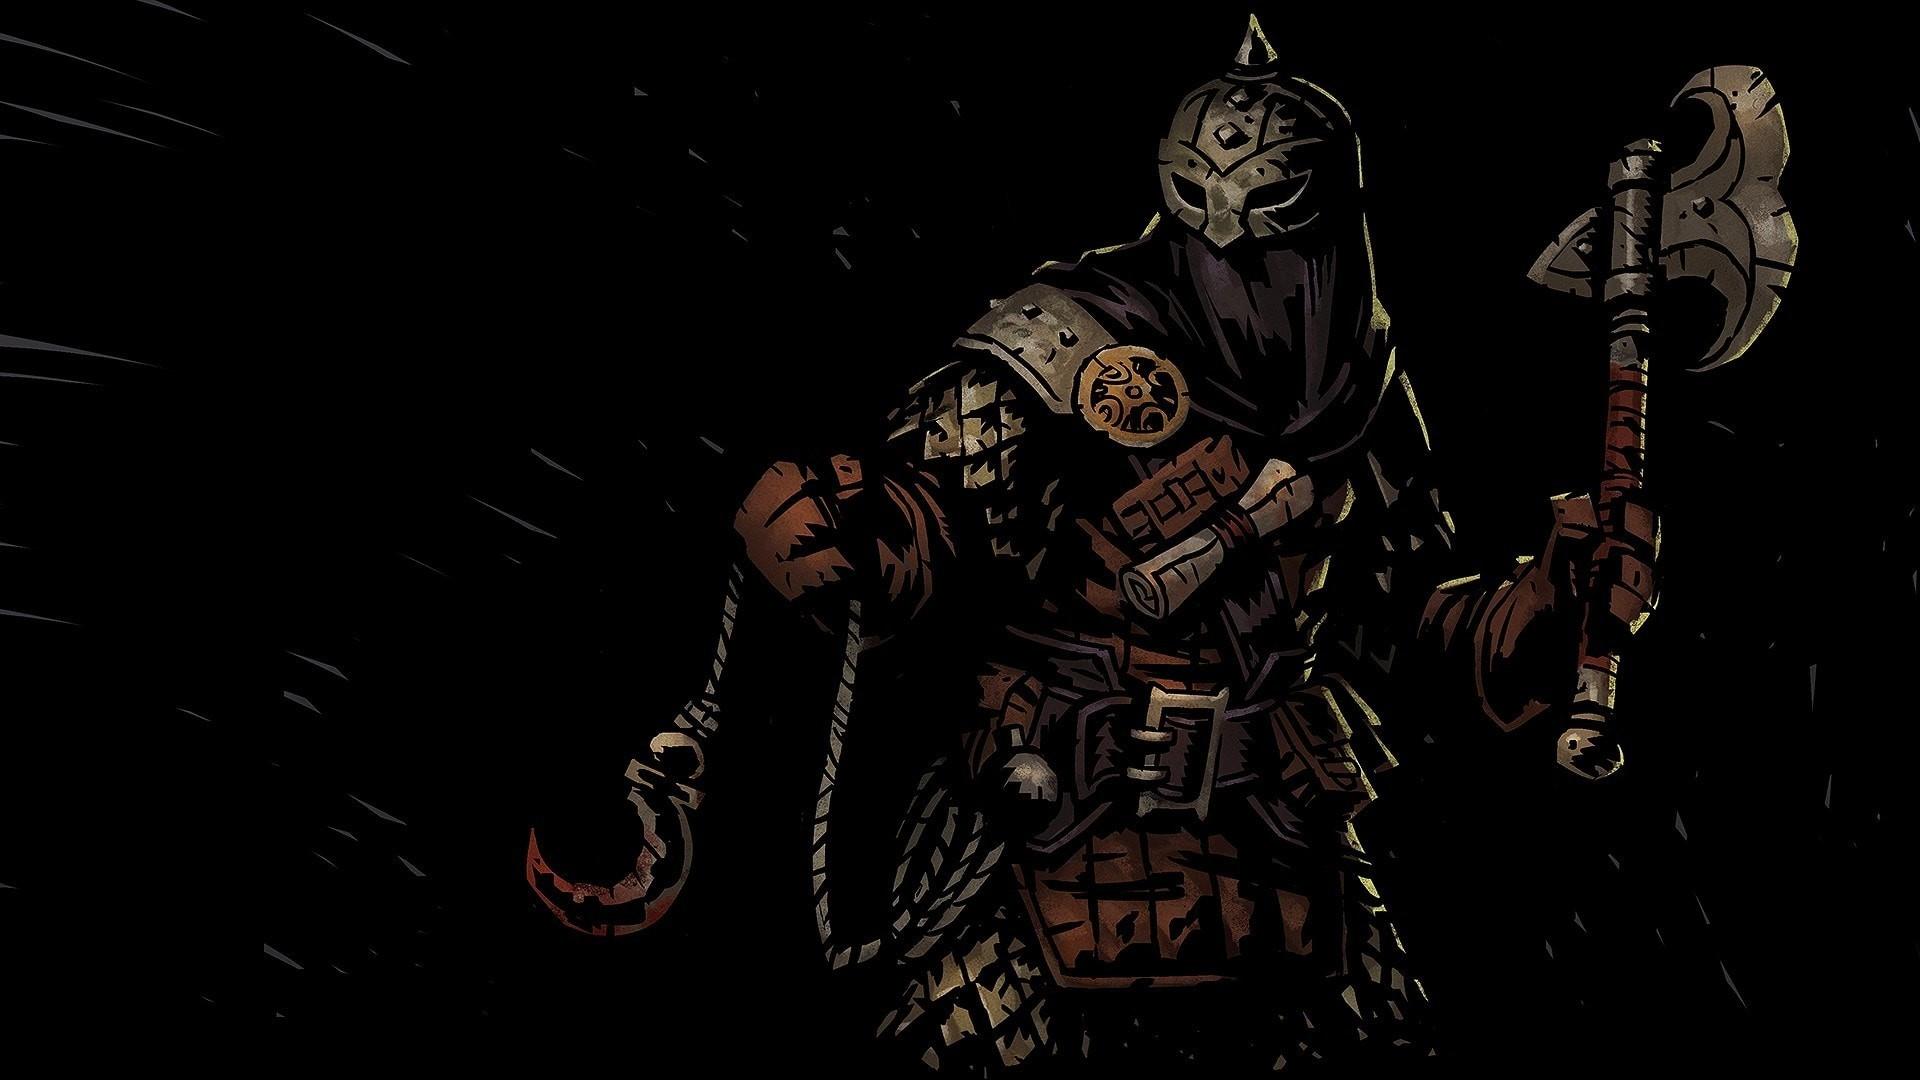 Res: 1920x1080, Darkest Dungeon: Bounty Hunter Wallpapers